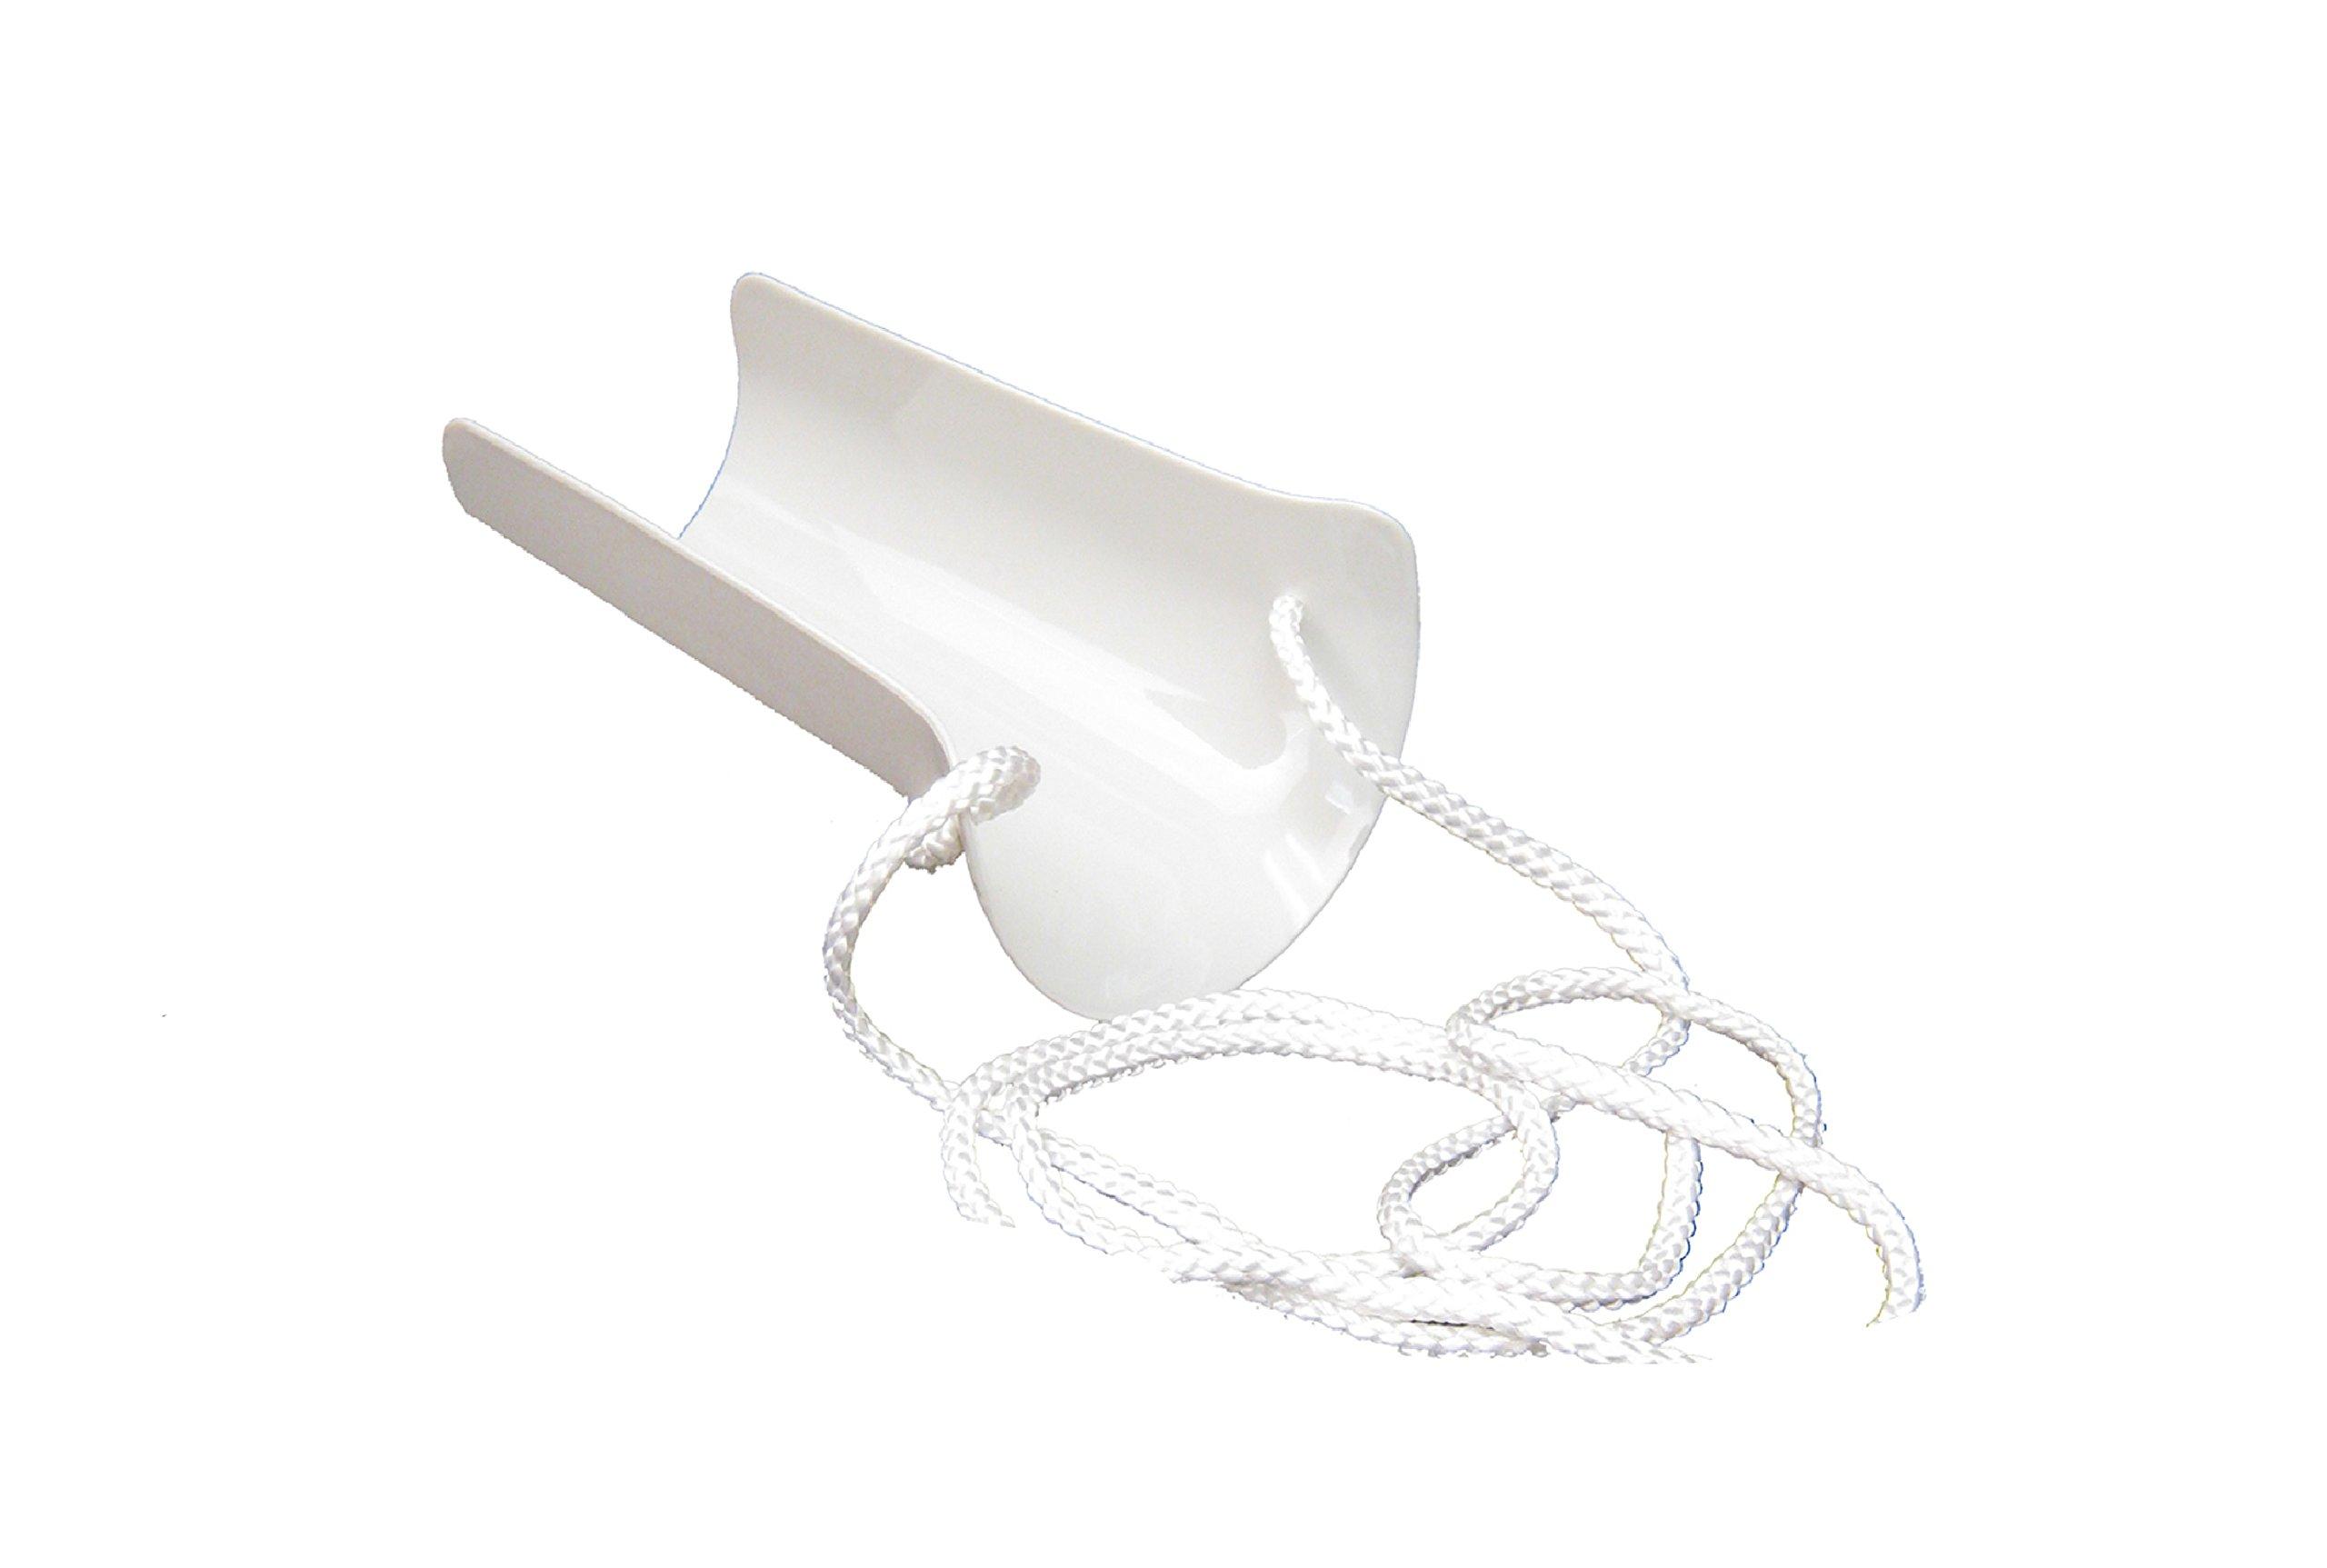 Sock Aid Standard white molded rigid